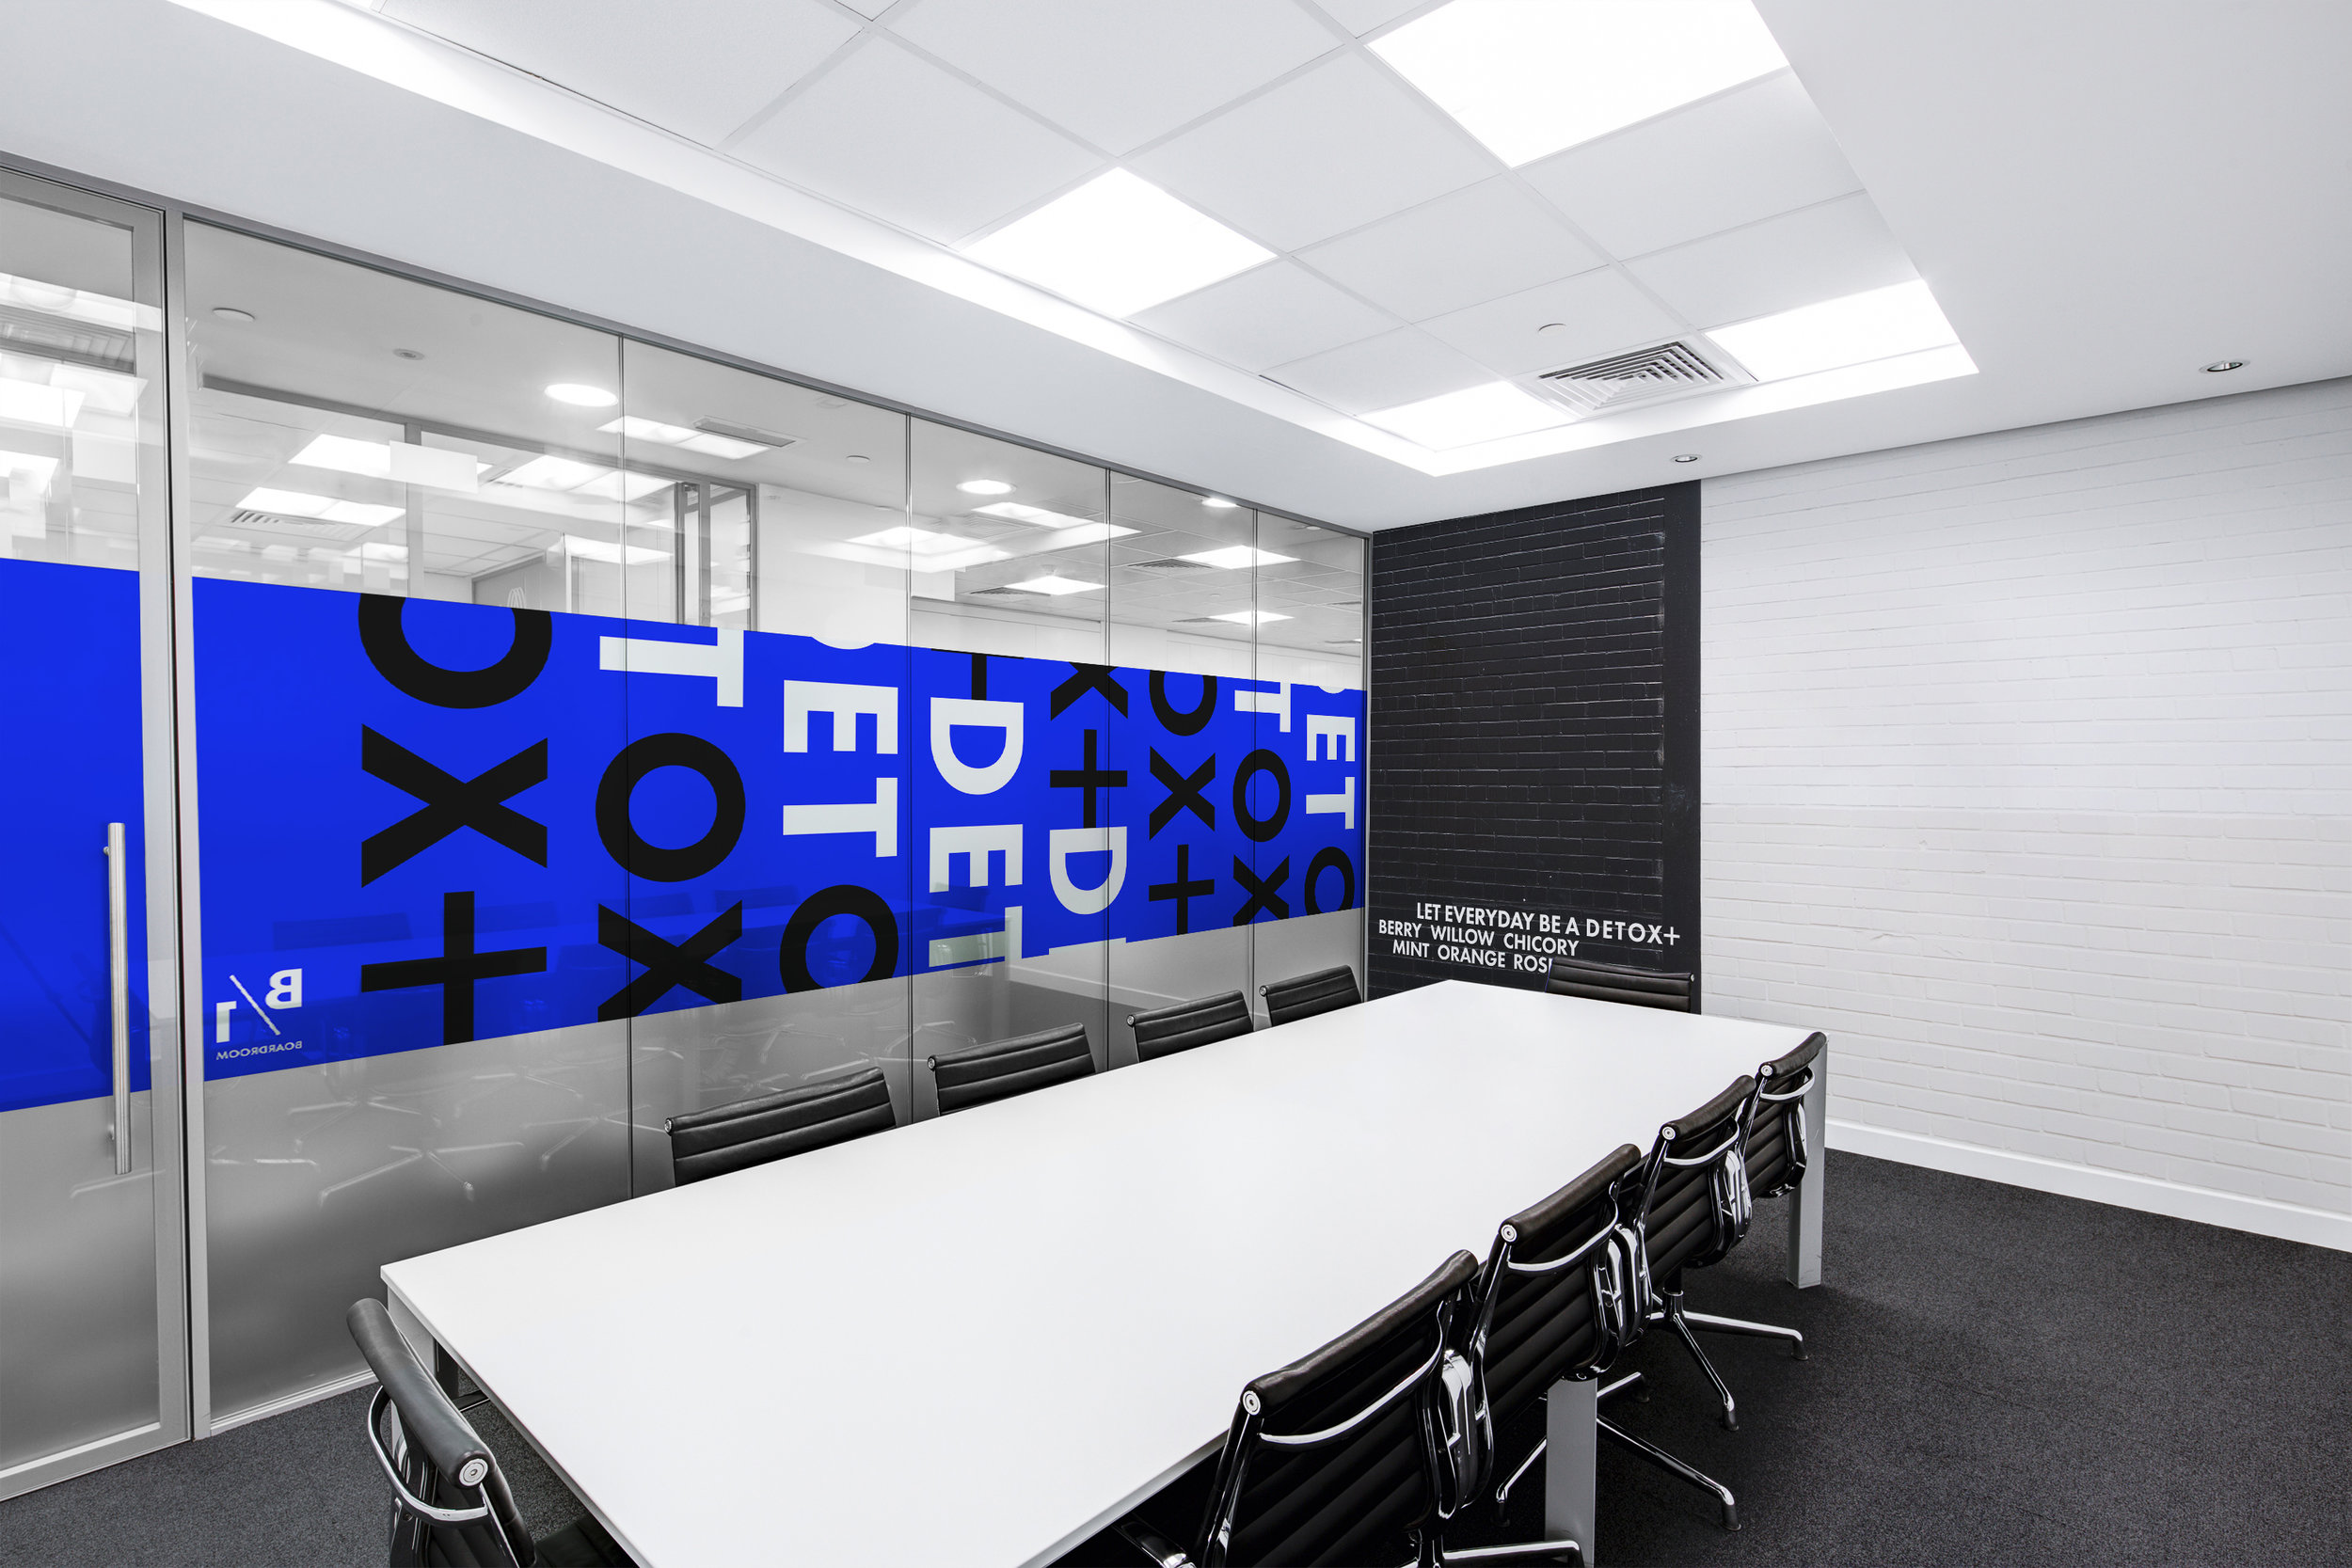 Detox Plus Packaging – Environmental design office interior